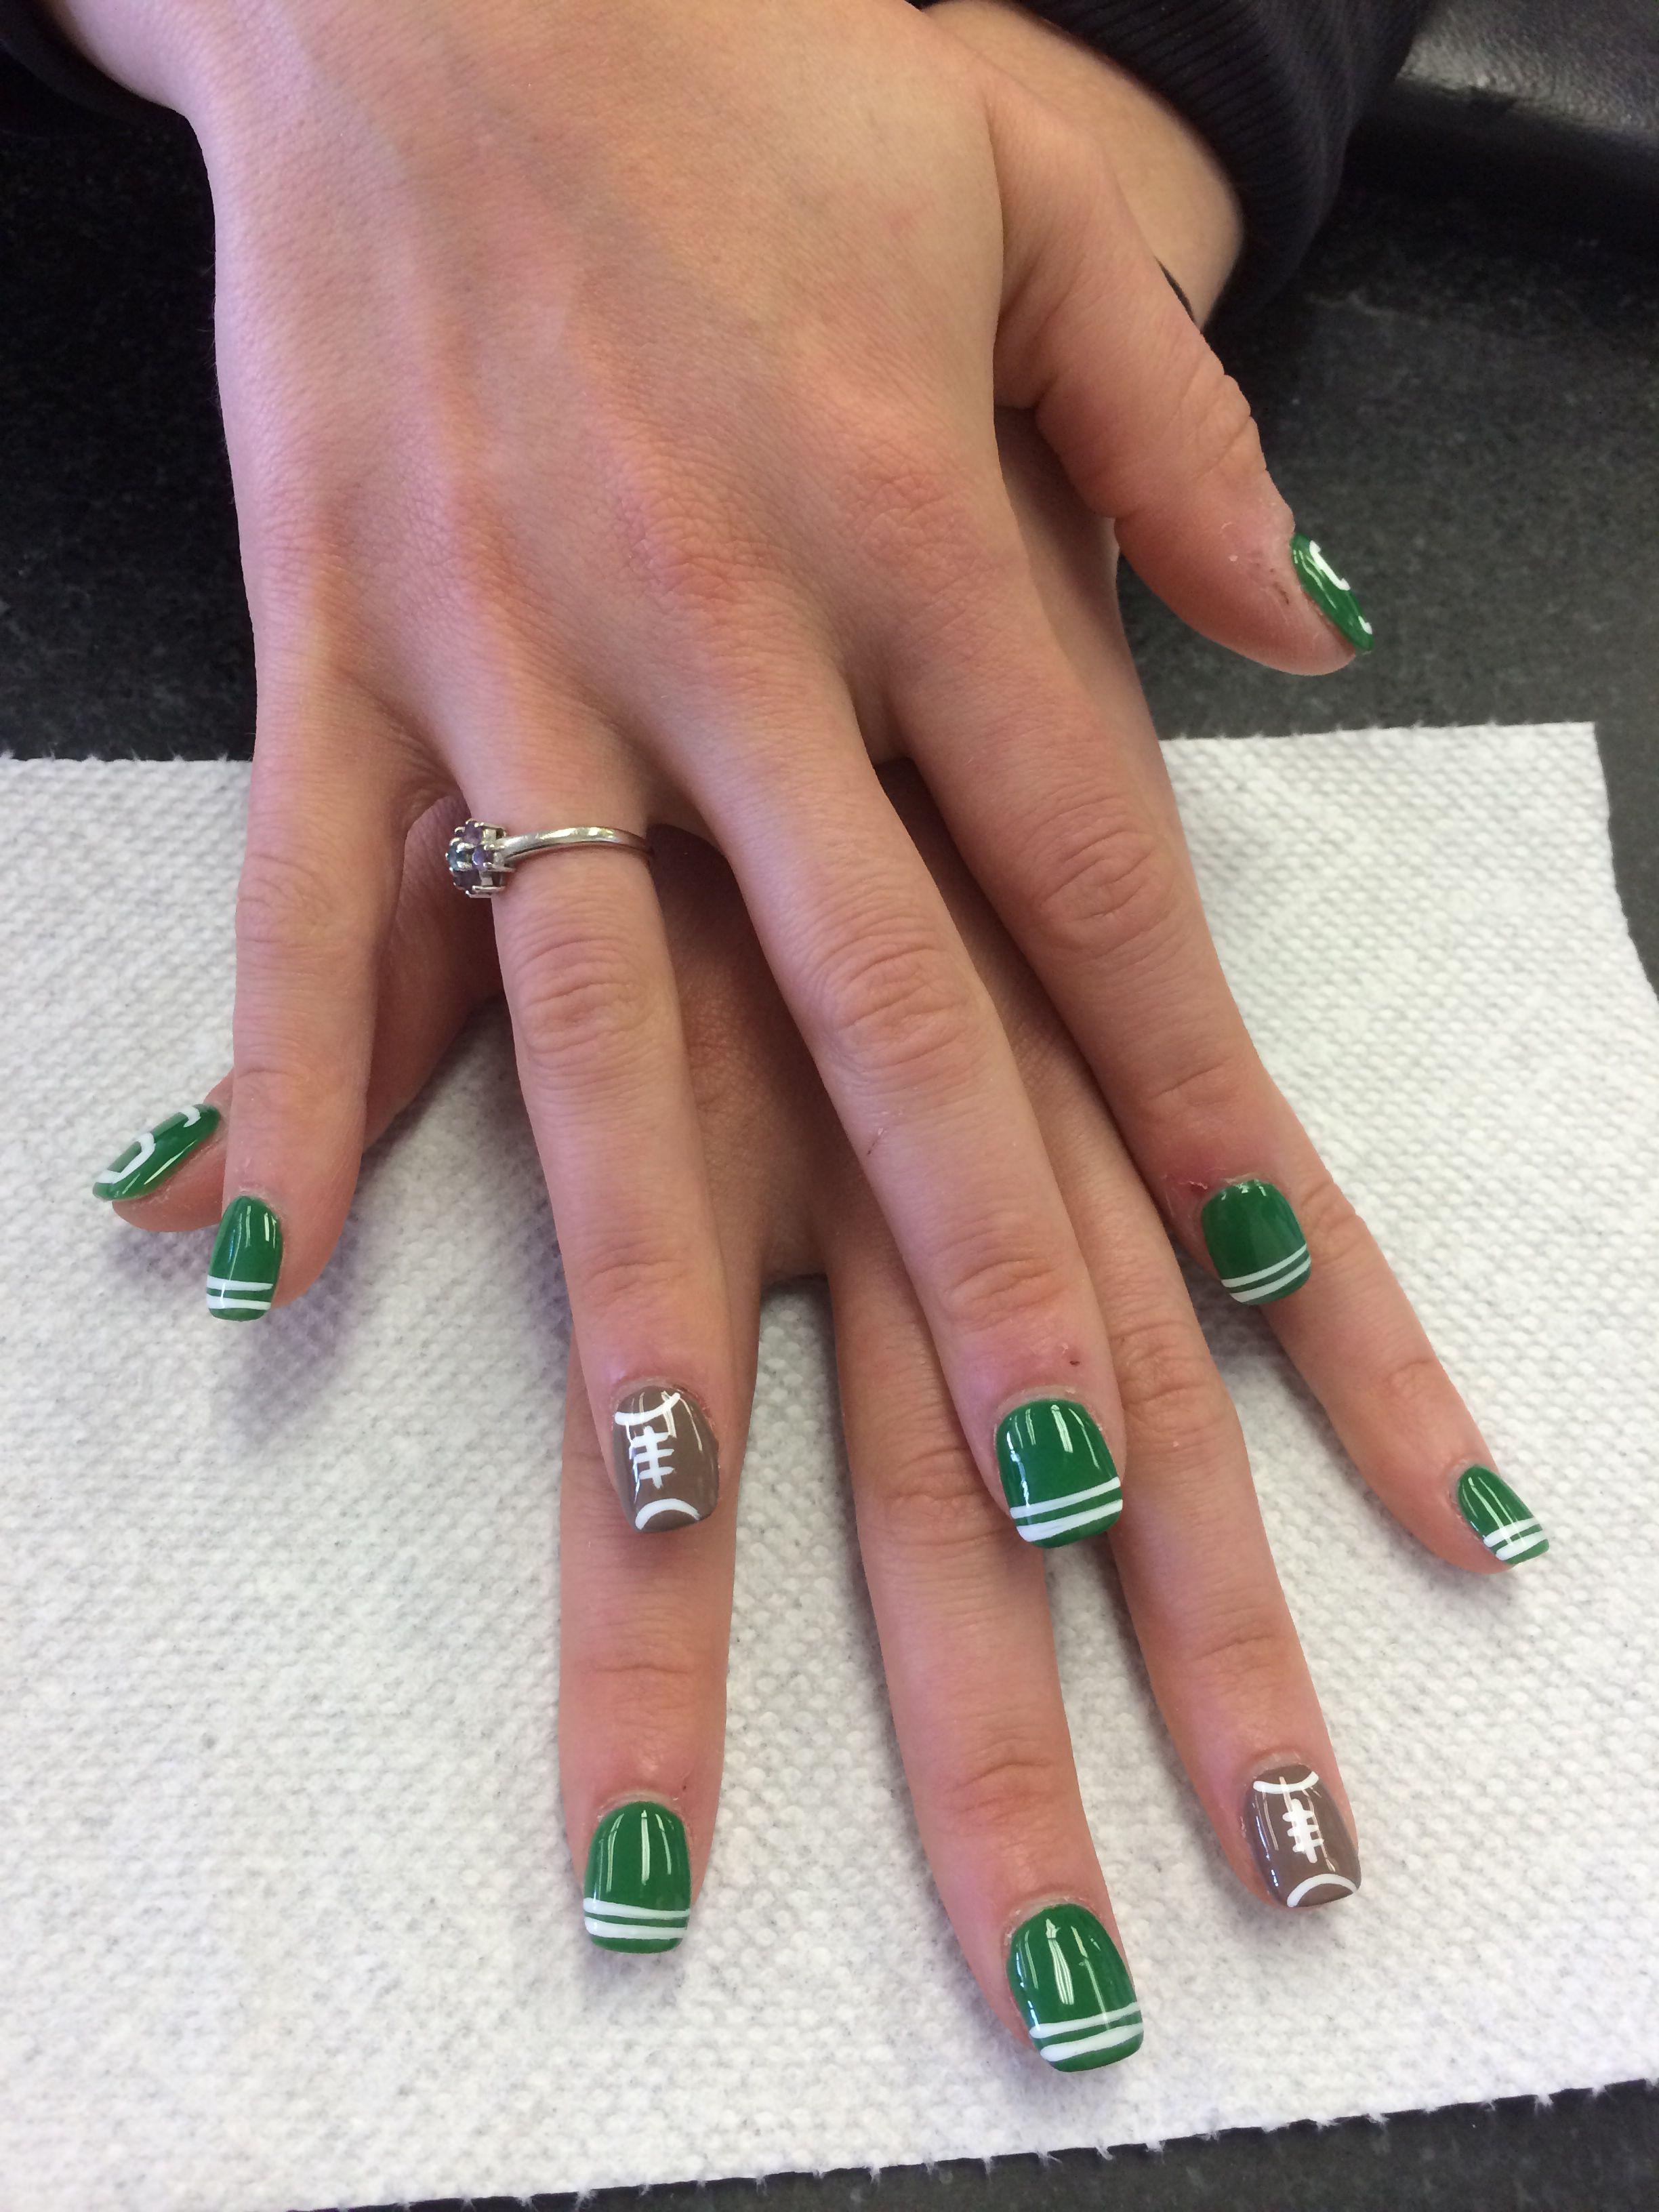 Michigan State Nail Art Designs Seahawks Nails Football Packer